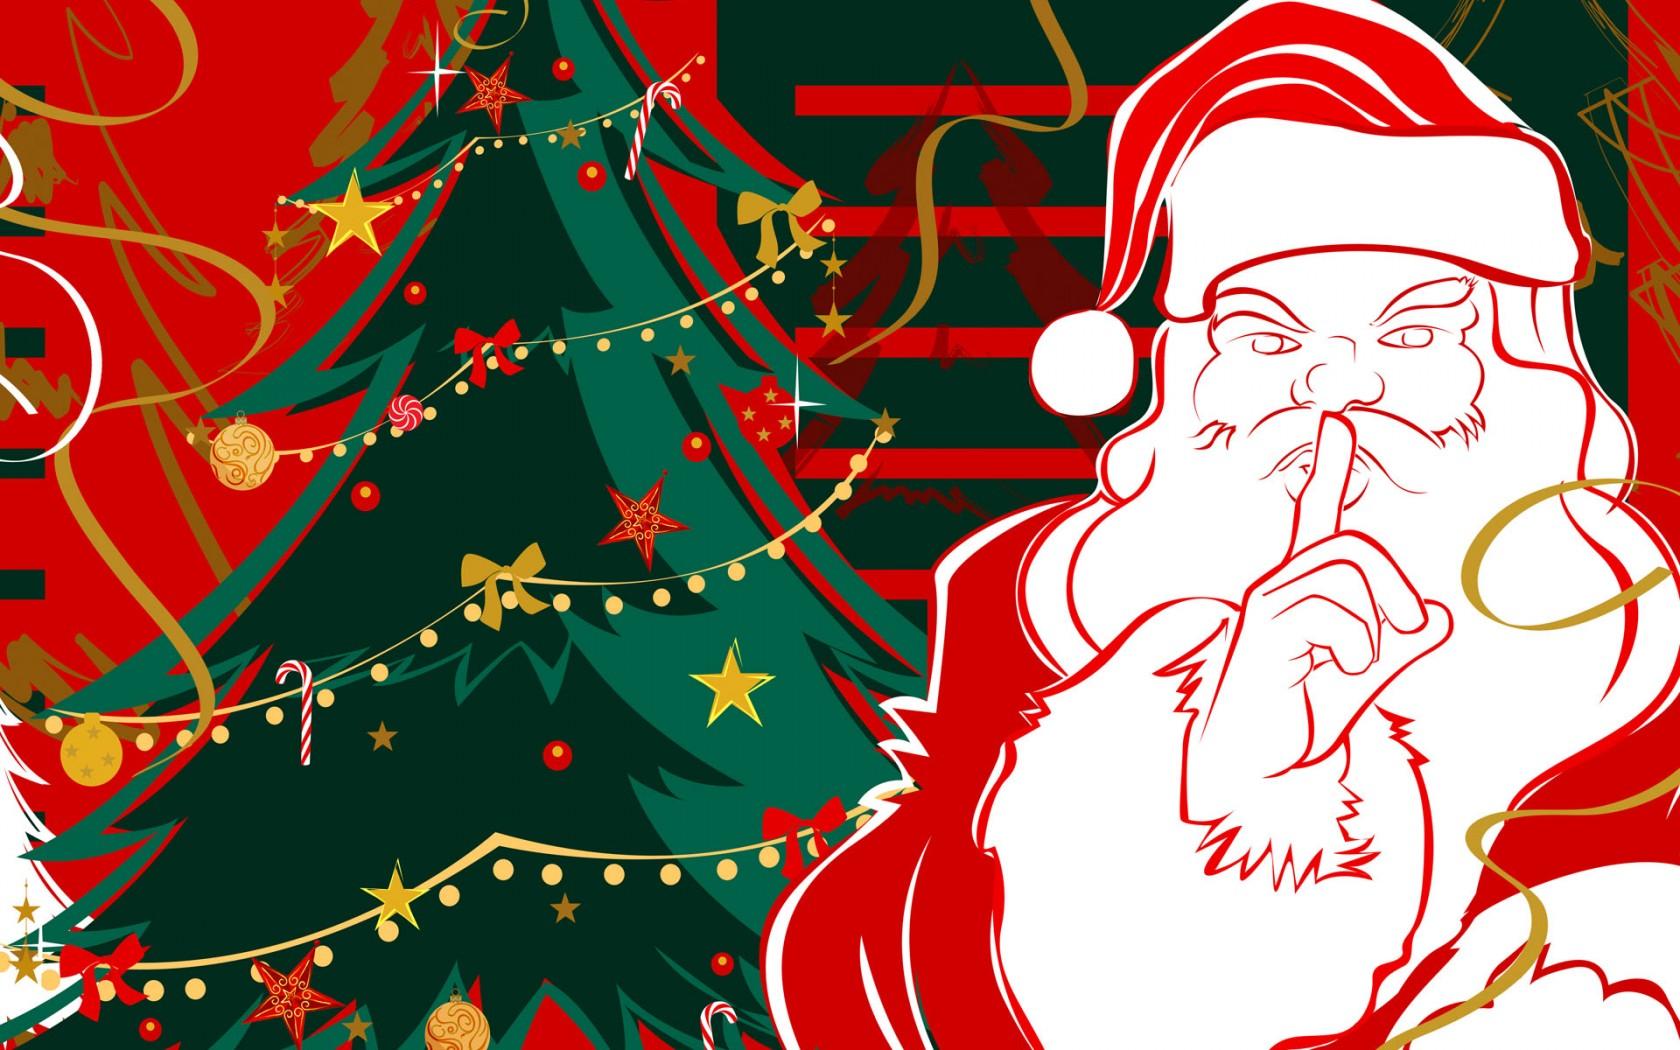 Vintage Cars Hd Wallpapers Free Download Santa Clause Xmas Wallpapers Hd Wallpapers Id 4773